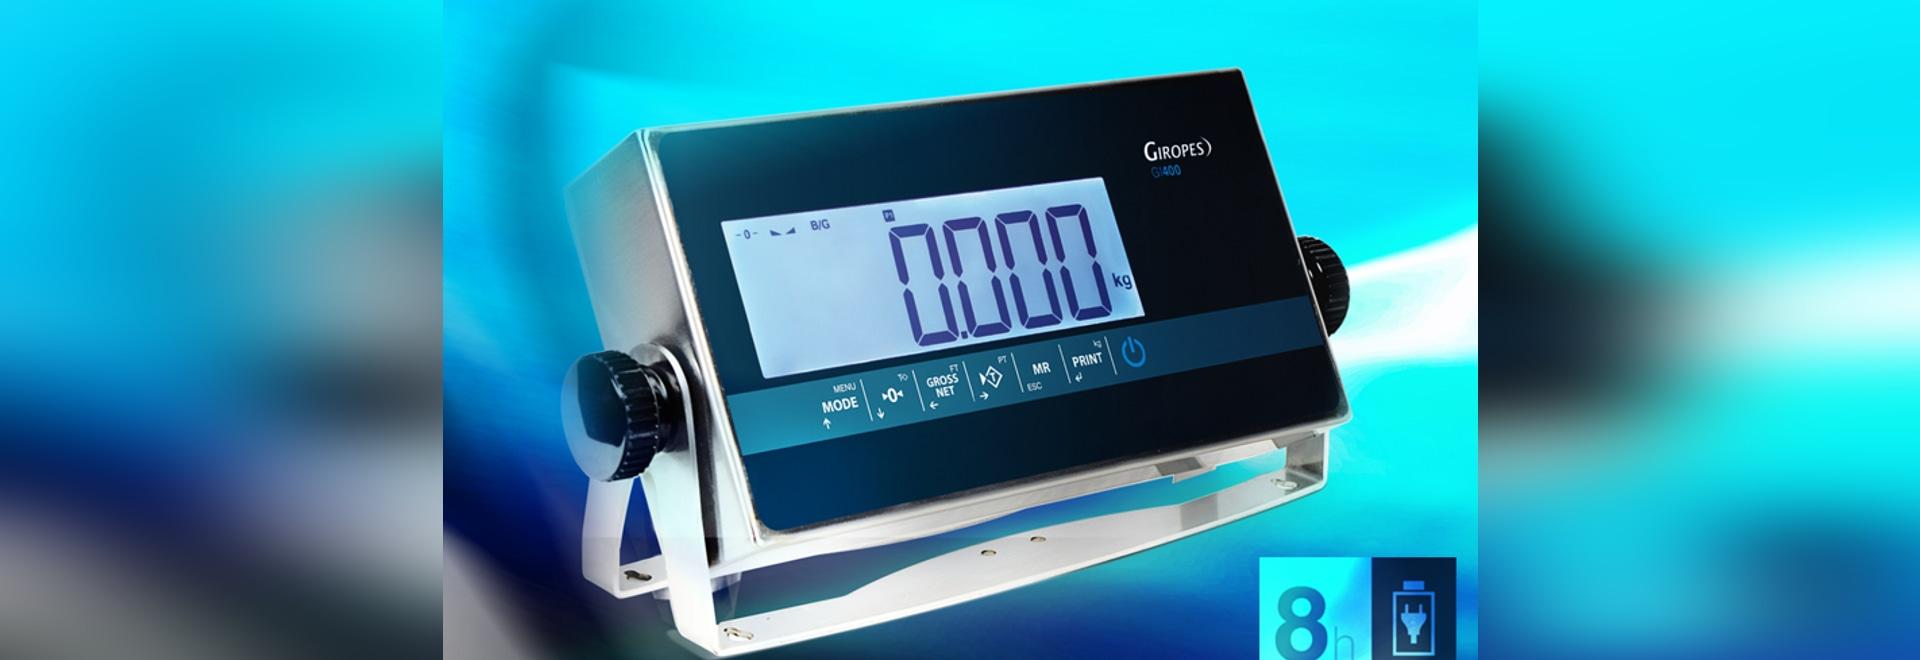 Nuevo indicador GI400 LCD BAT LI ION